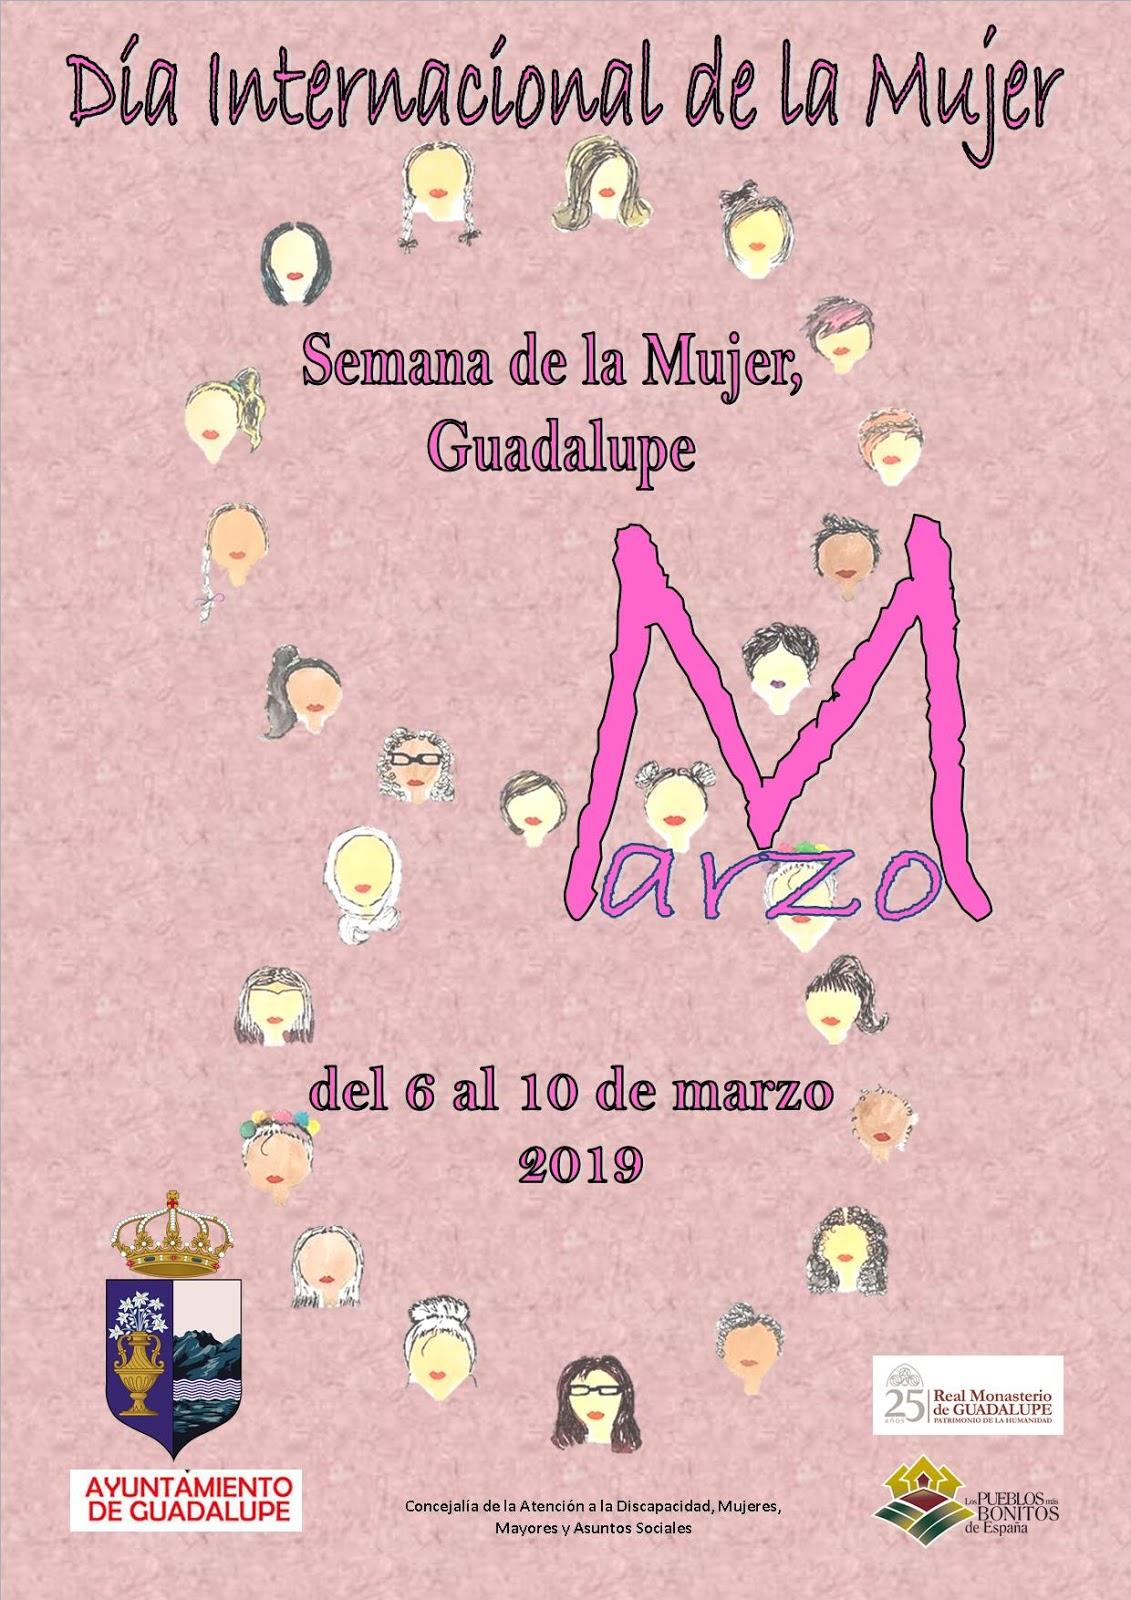 Semana de la mujer 2019 - Guadalupe (Cáceres) 1